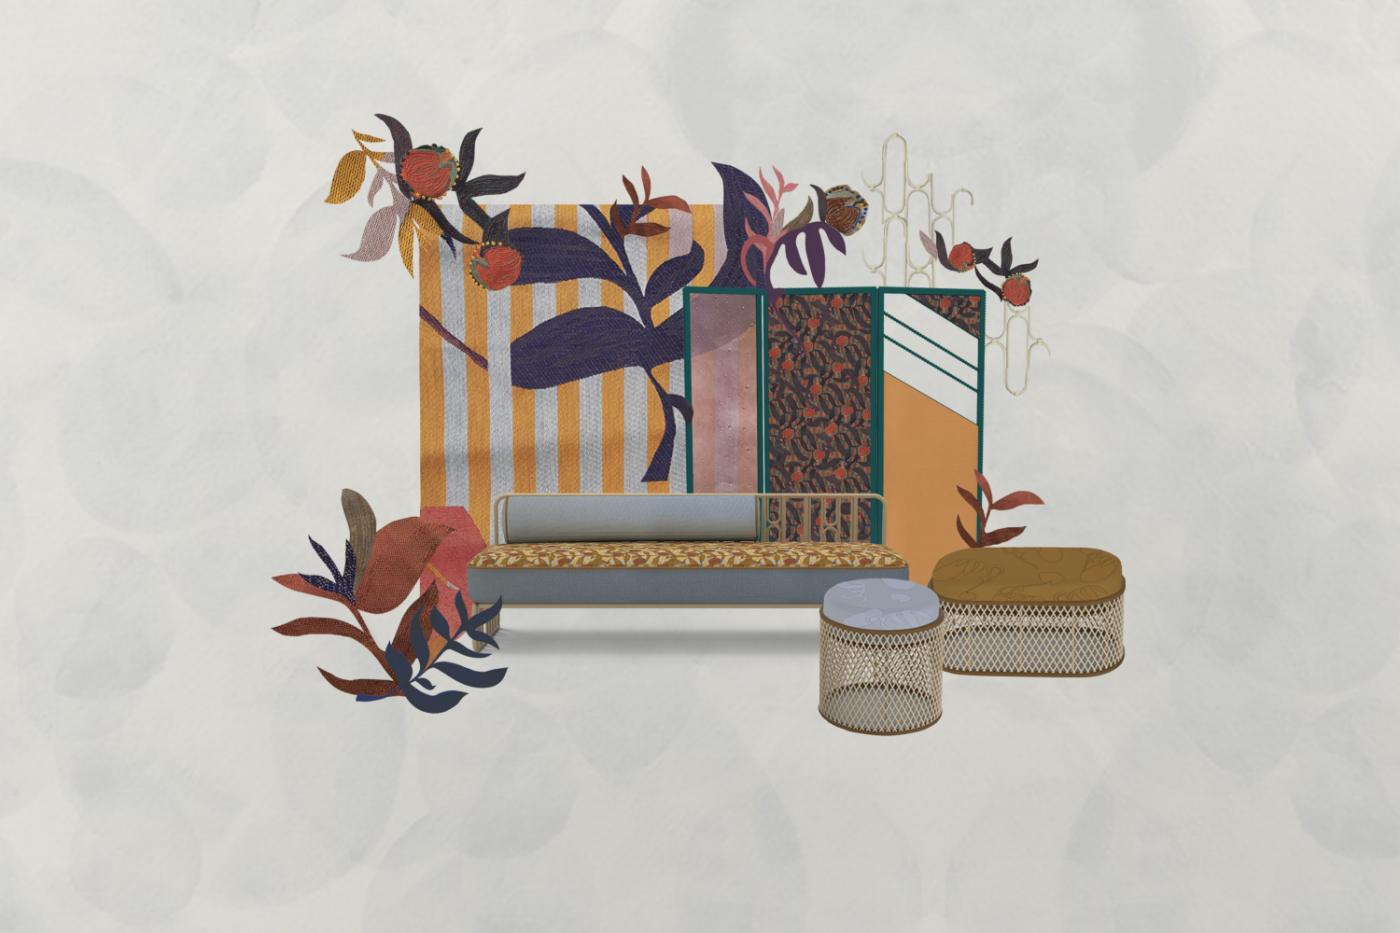 cristina celestino Cristina Celestino and Maison Matisse Join Forces For A Furniture Collection collection de cristina celestino c maison matisse 1598868523 1 1400x933